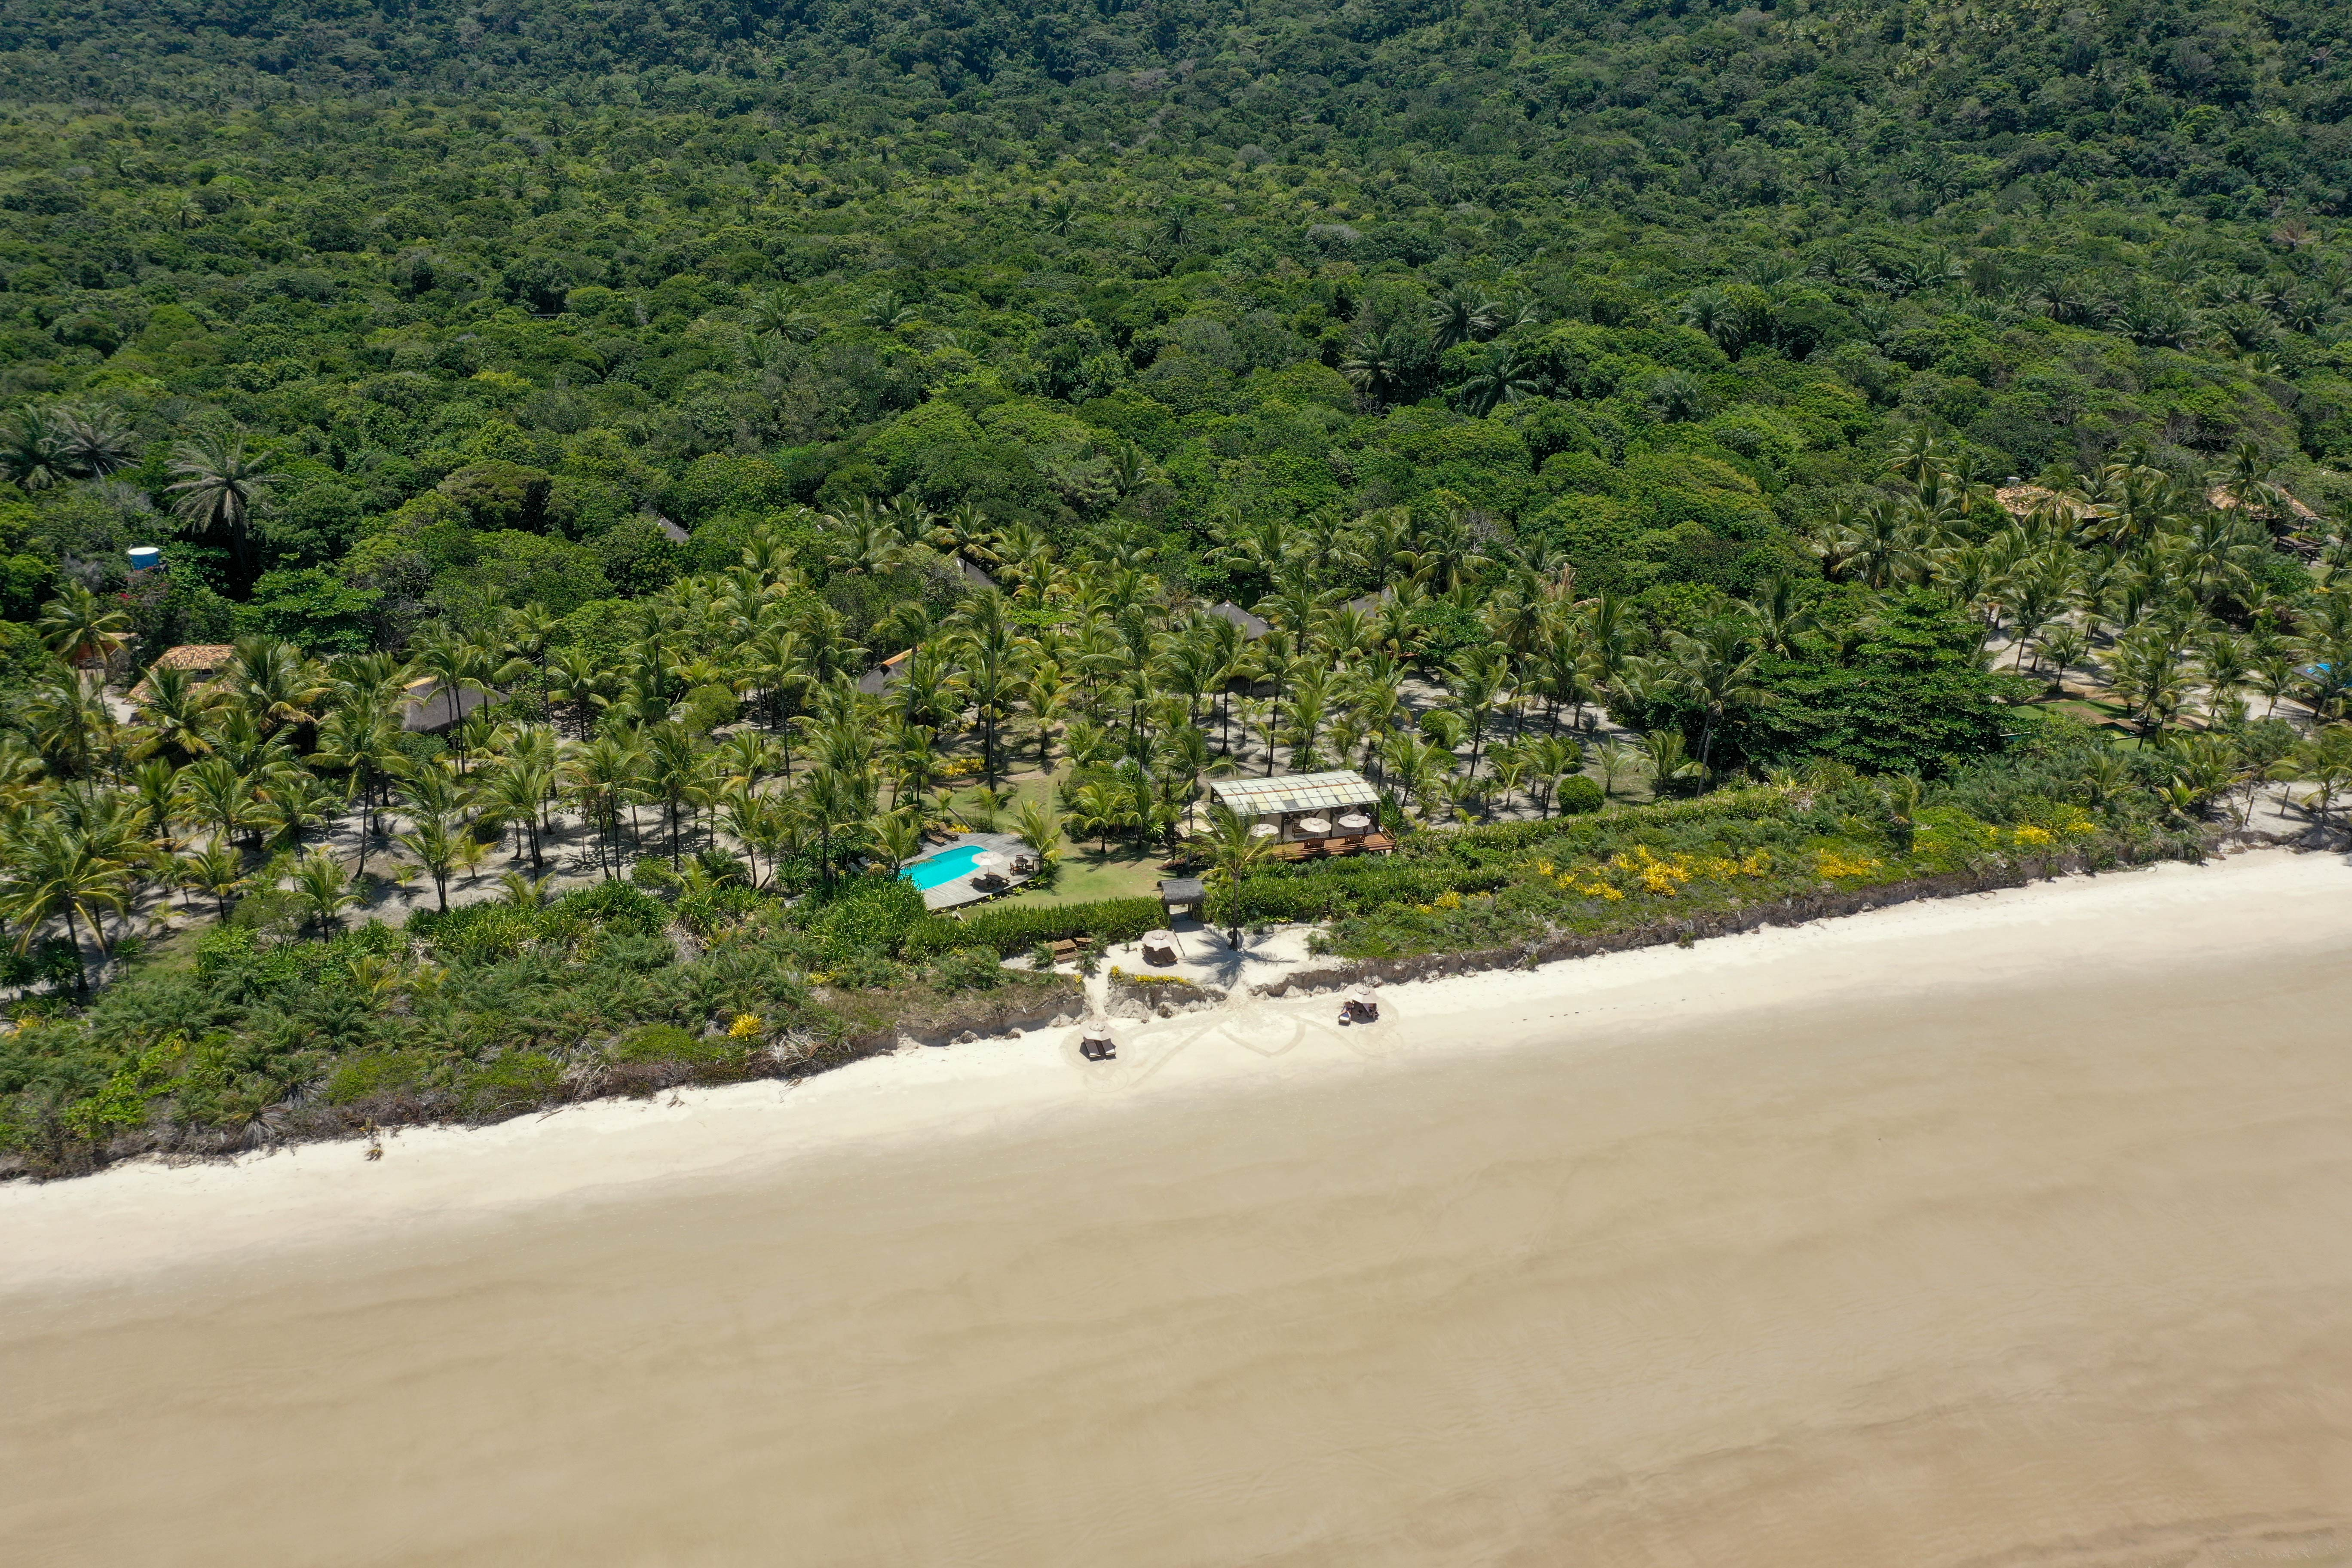 Ecolodge in Bahia Brazil with Beach Rainforest